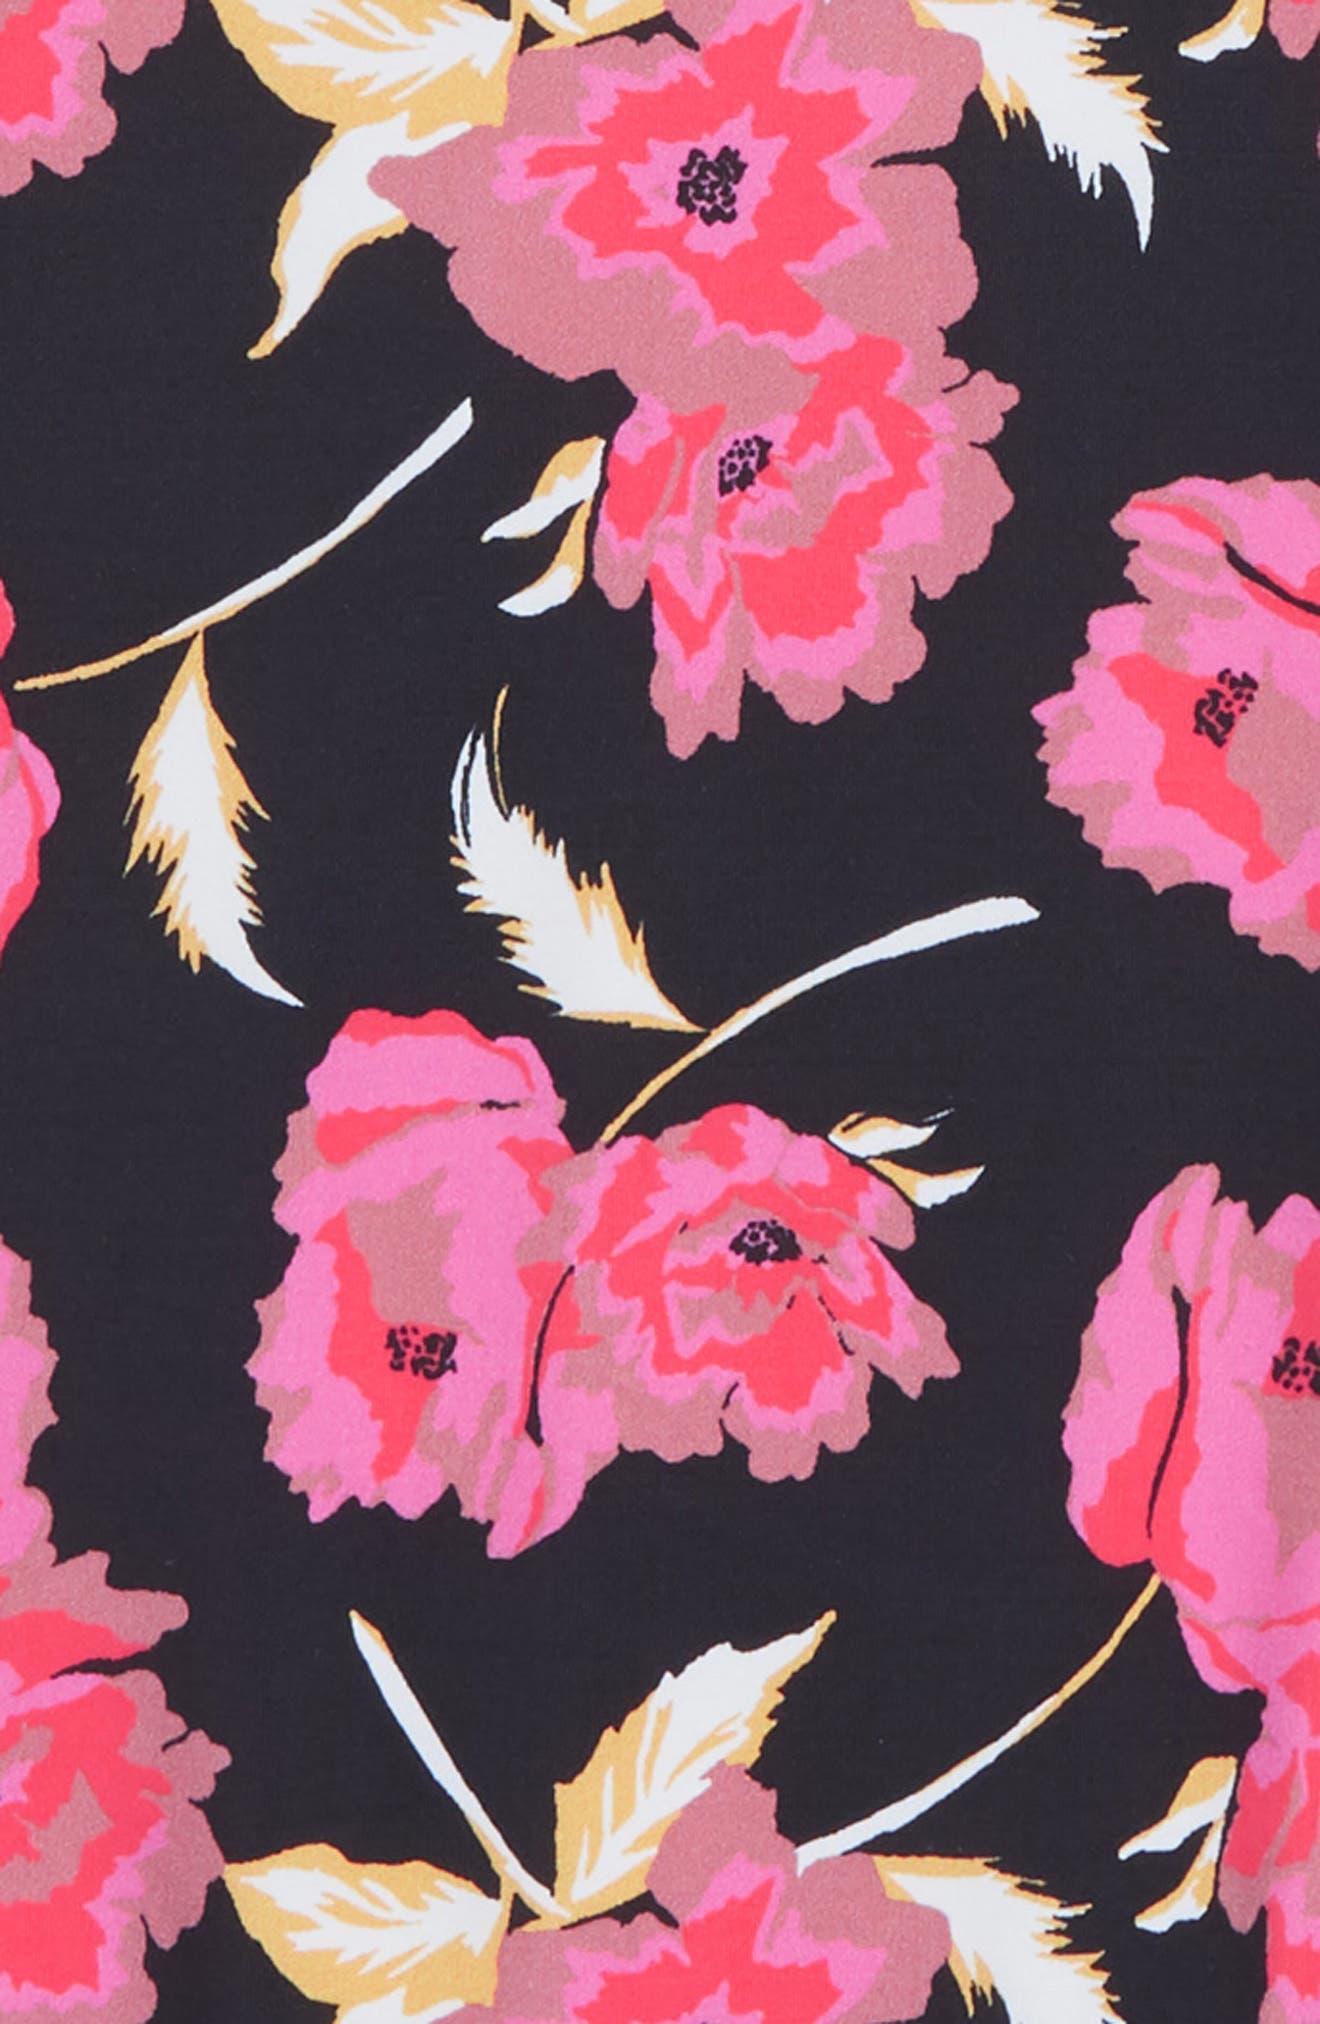 Floral Dawn One-Piece Rashguard Swimsuit,                             Alternate thumbnail 2, color,                             Black Pebble